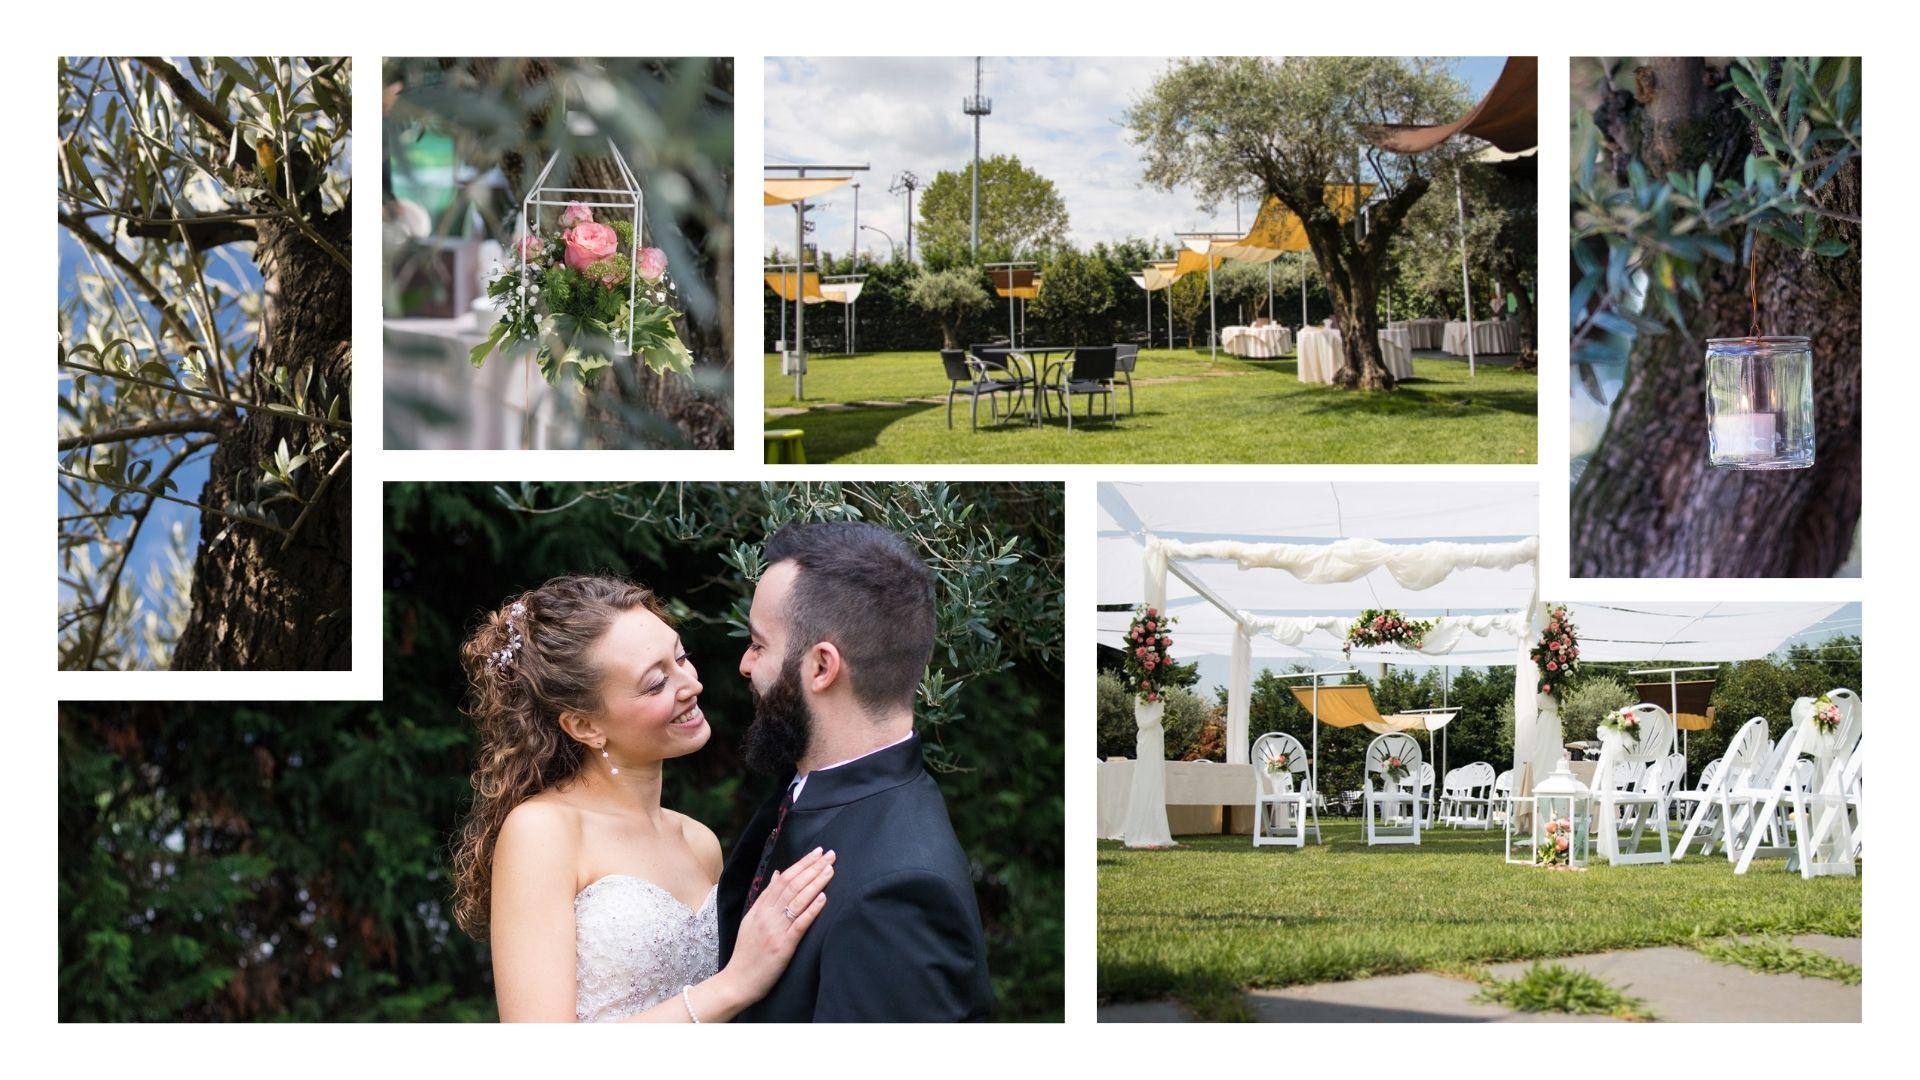 giardino matrimoni porta delle langhe cherasco